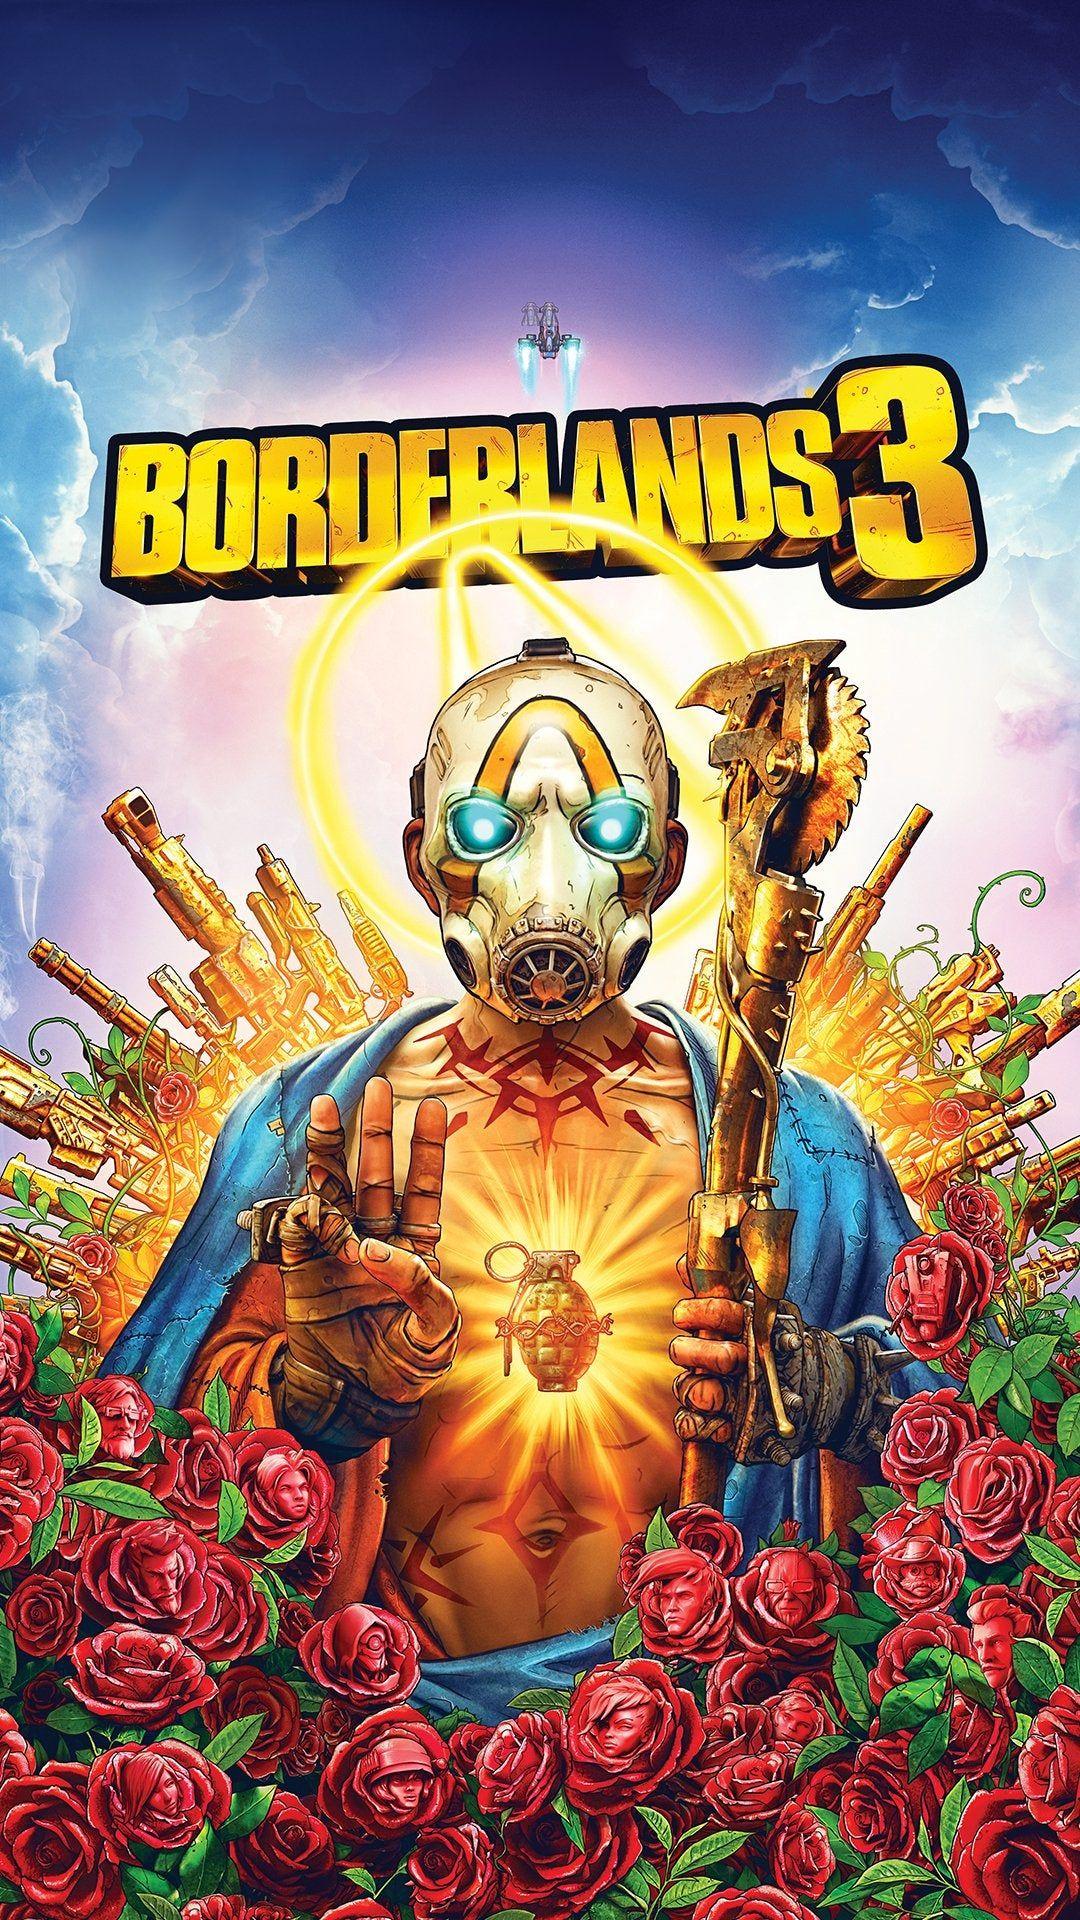 Borderlands 3 Phone Wallpapers Wallpaper Cave